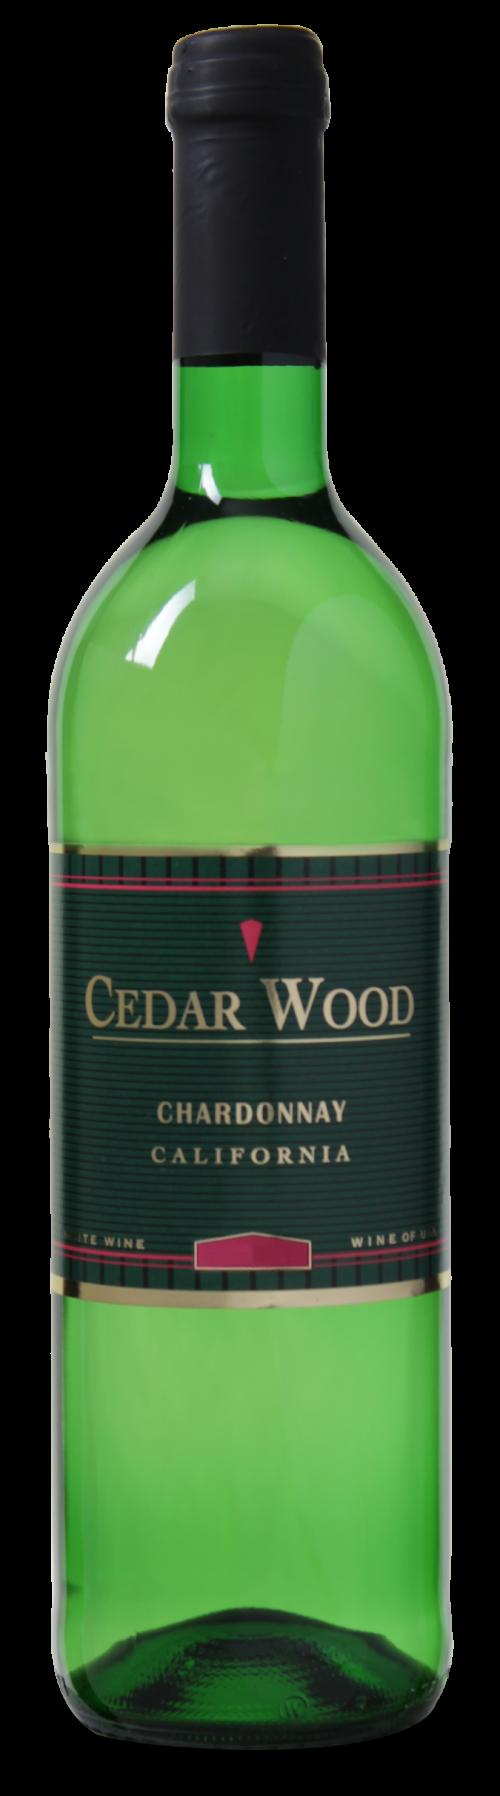 Cedar Wood - Chardonnay